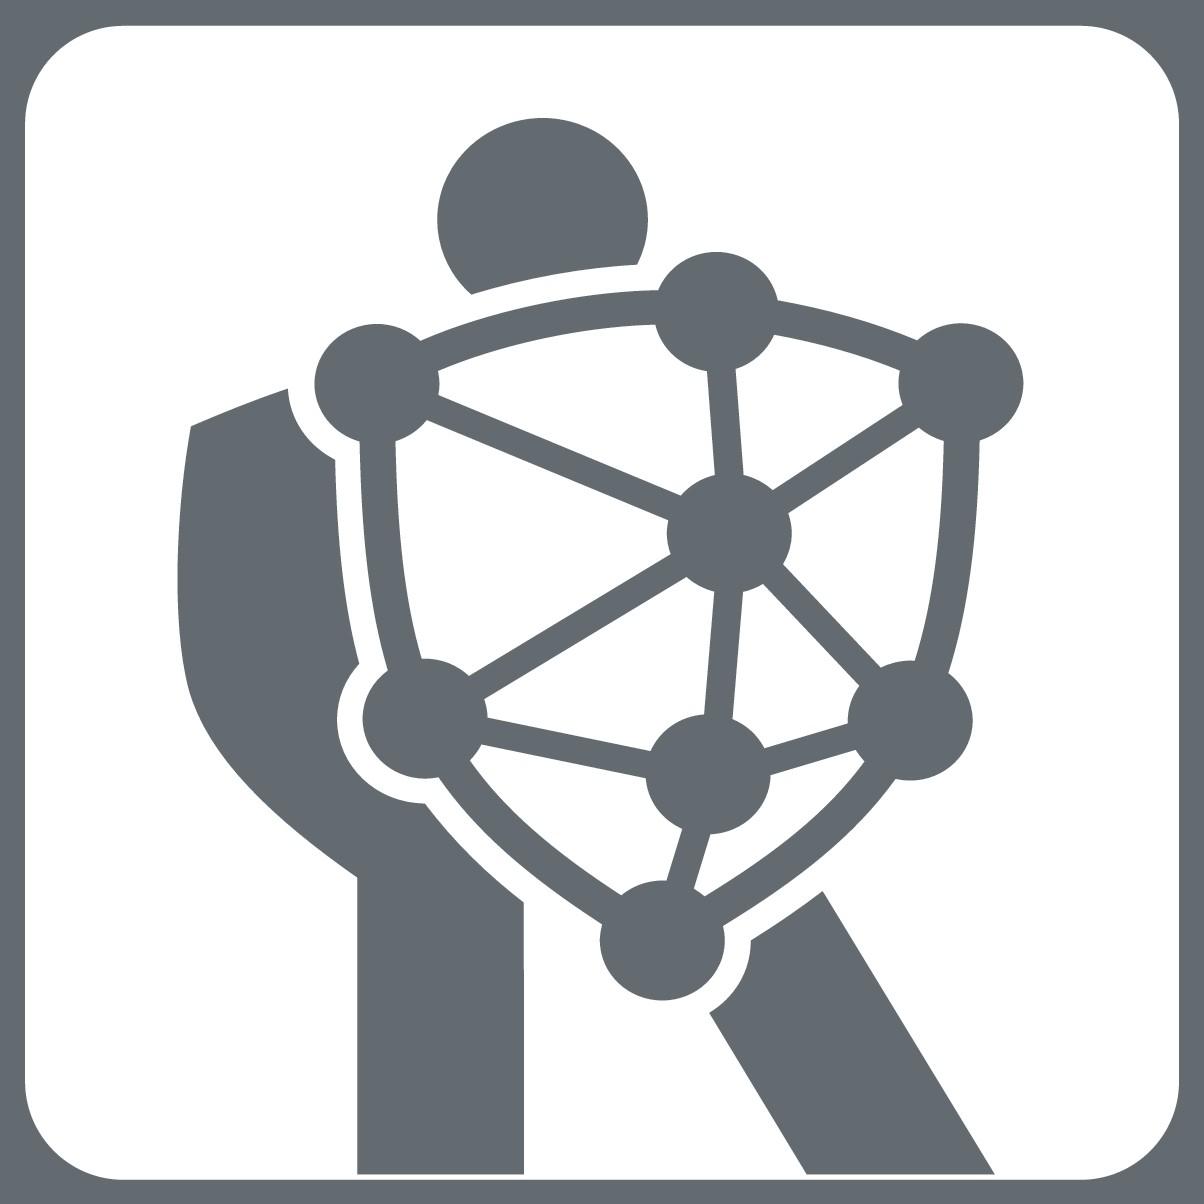 Additional logo variations for RISXX based on existing design